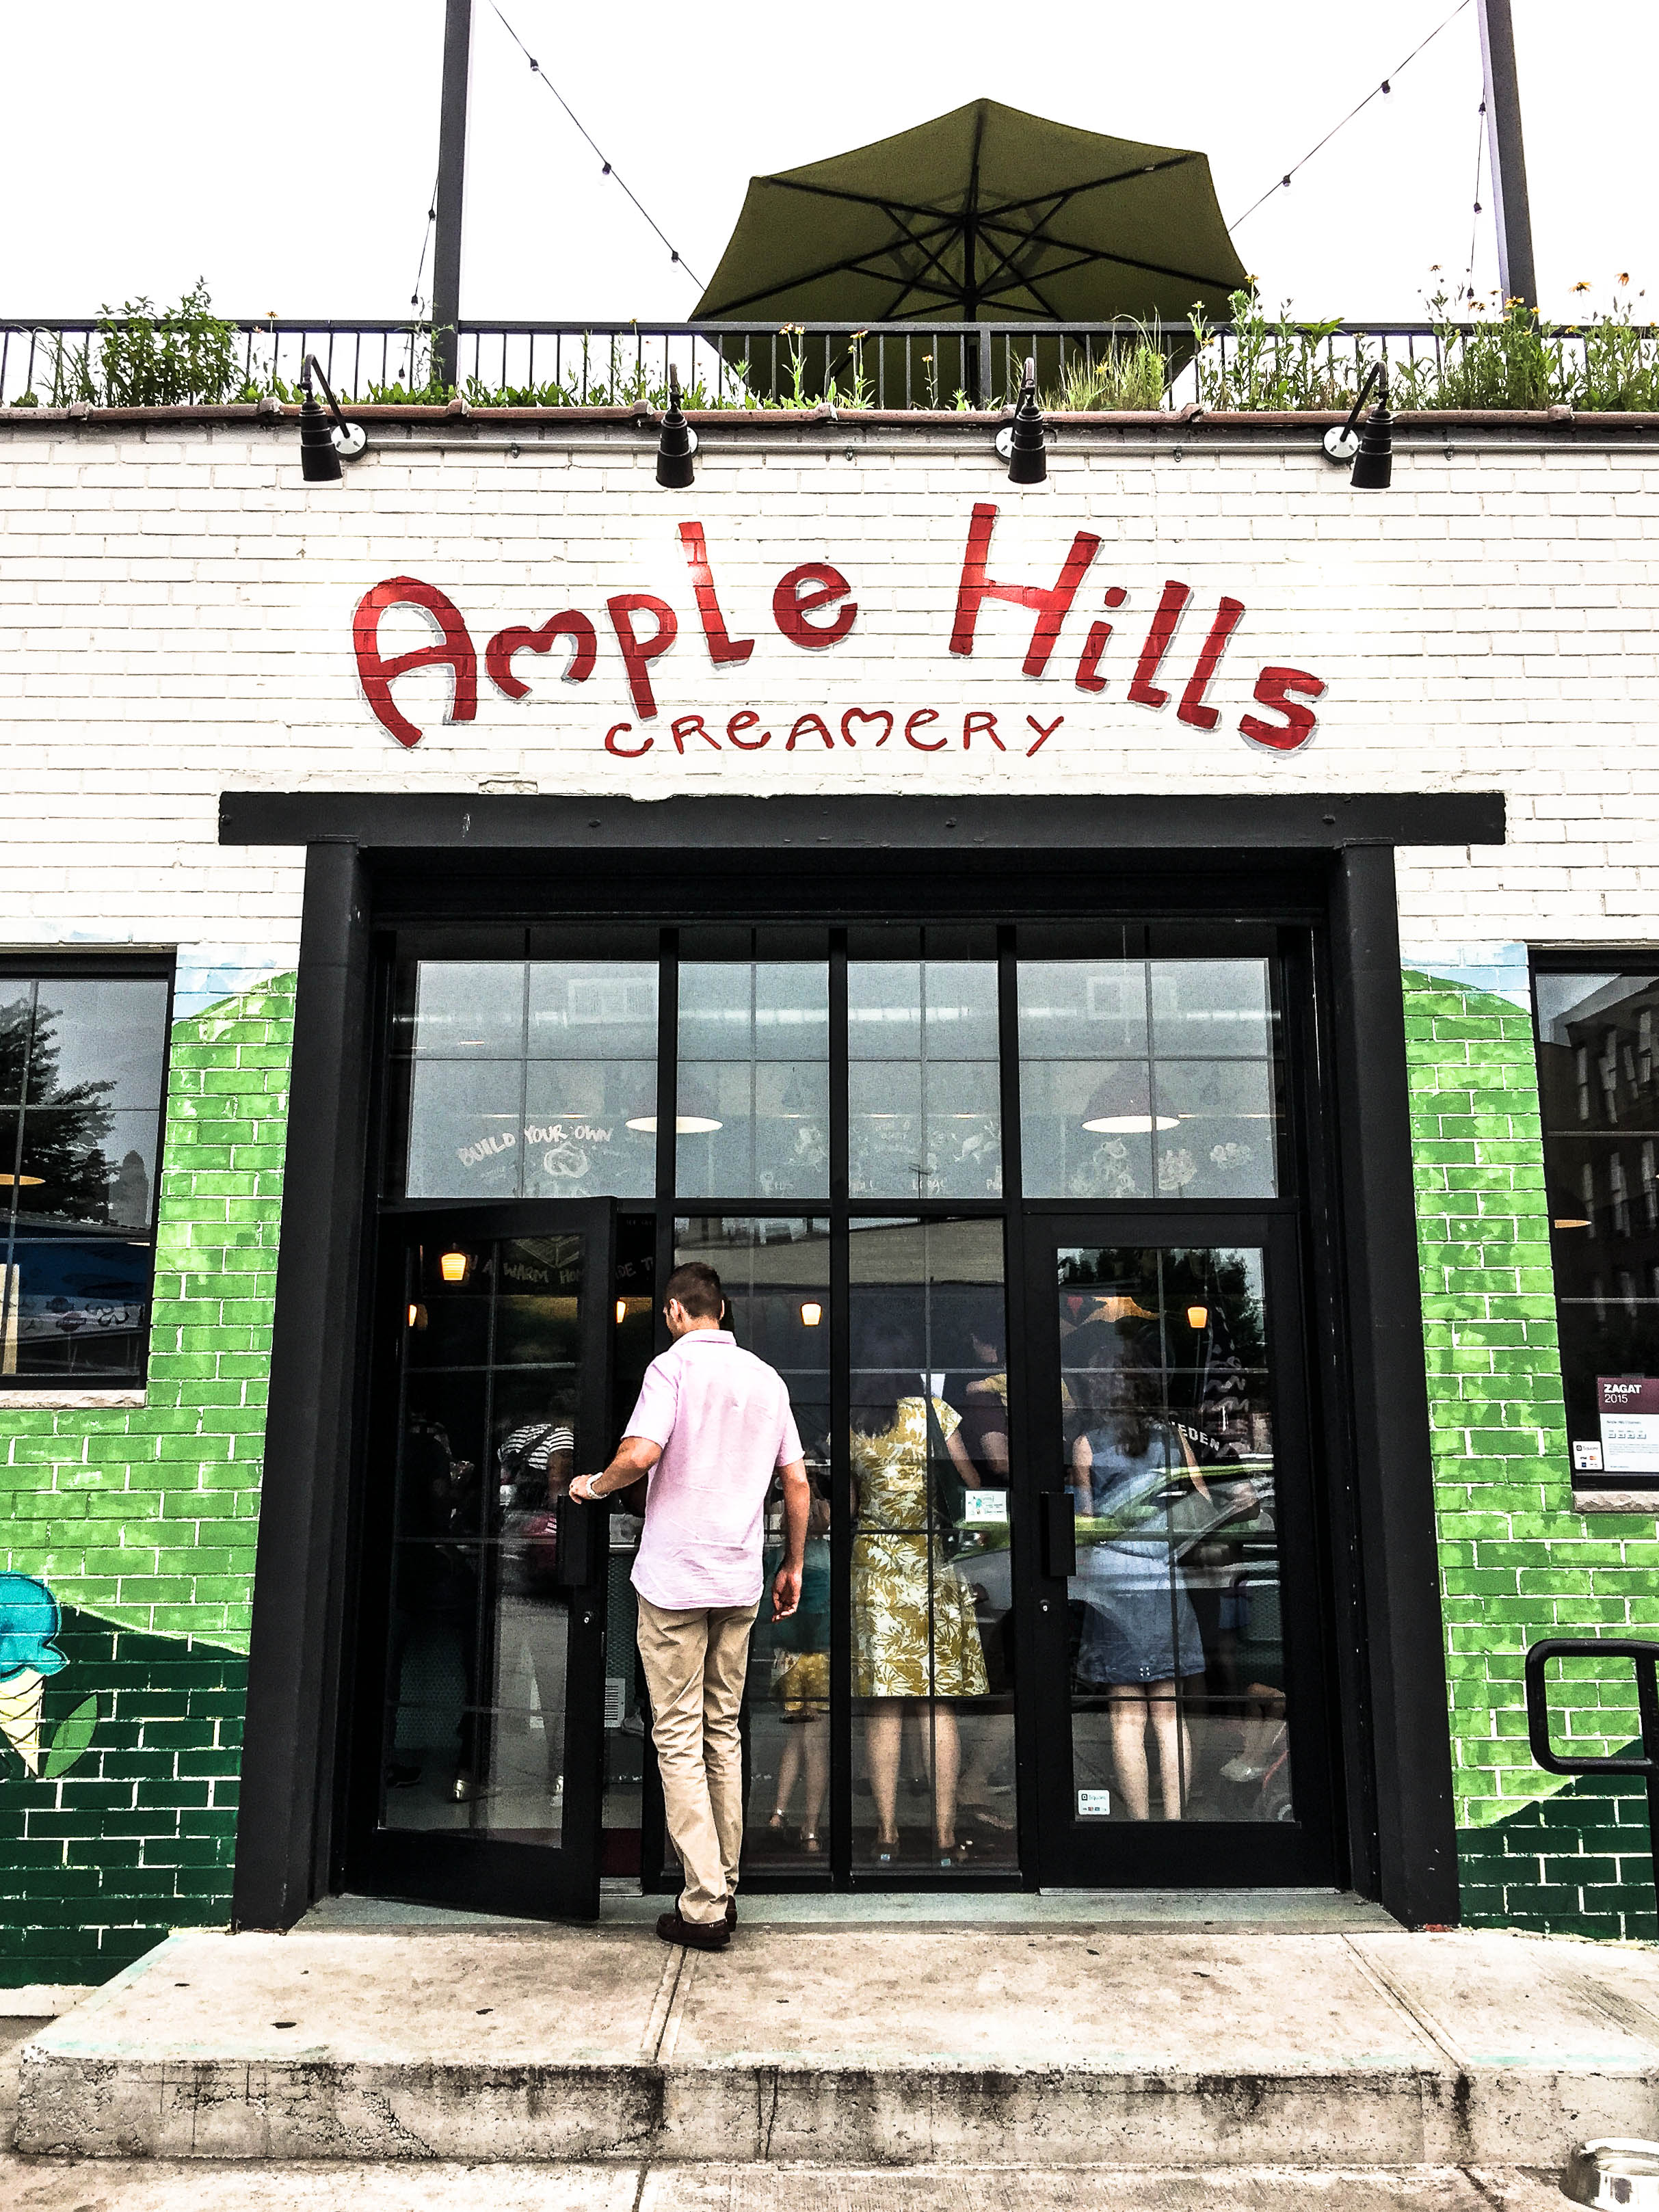 ROSE & IVY Journal A Taste of New York Ample Hills Creamery